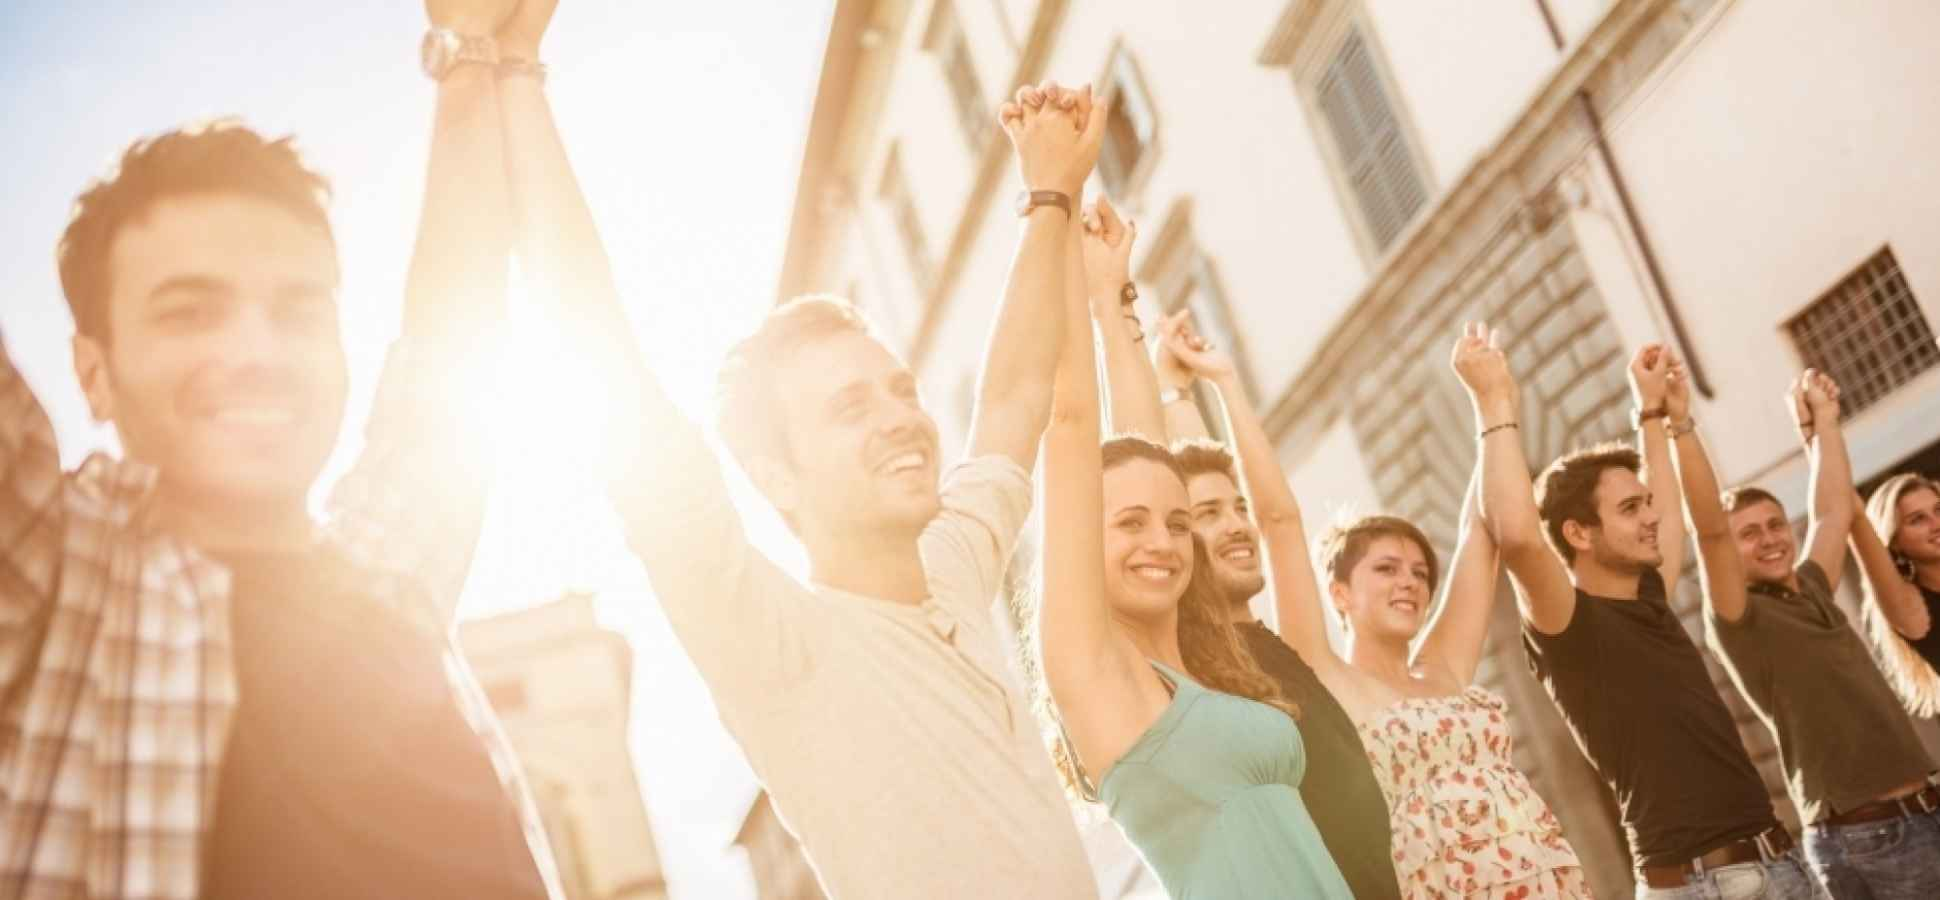 The Secret on How to Motivate Millennials